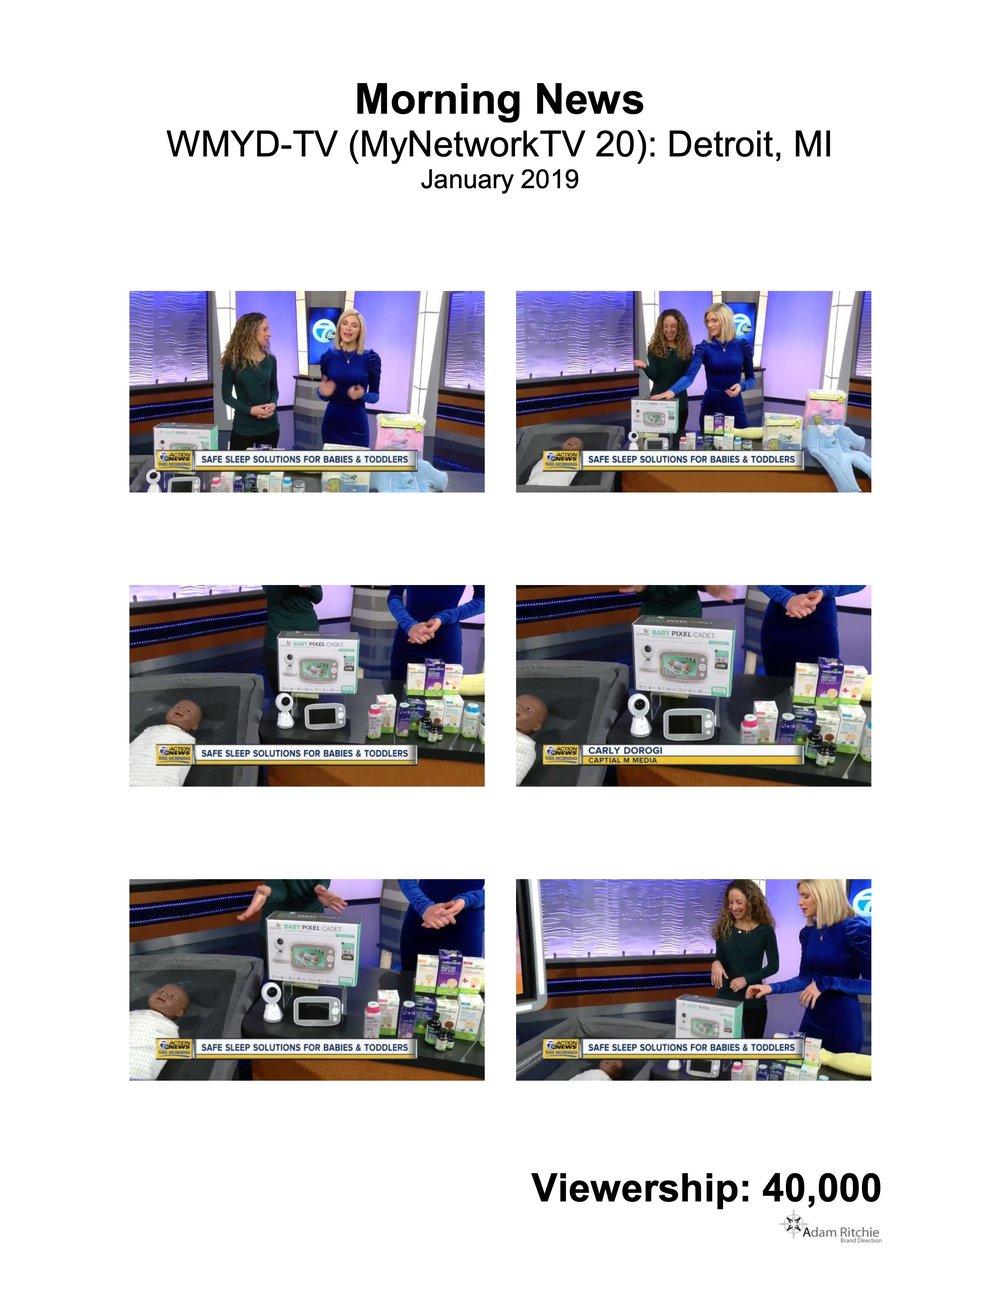 2019.01.30_WMYD-TV (MyNetworkTV 20) Detroit, Morning News_Summer Infant Baby Pixel Cadet Video Monitor.jpeg